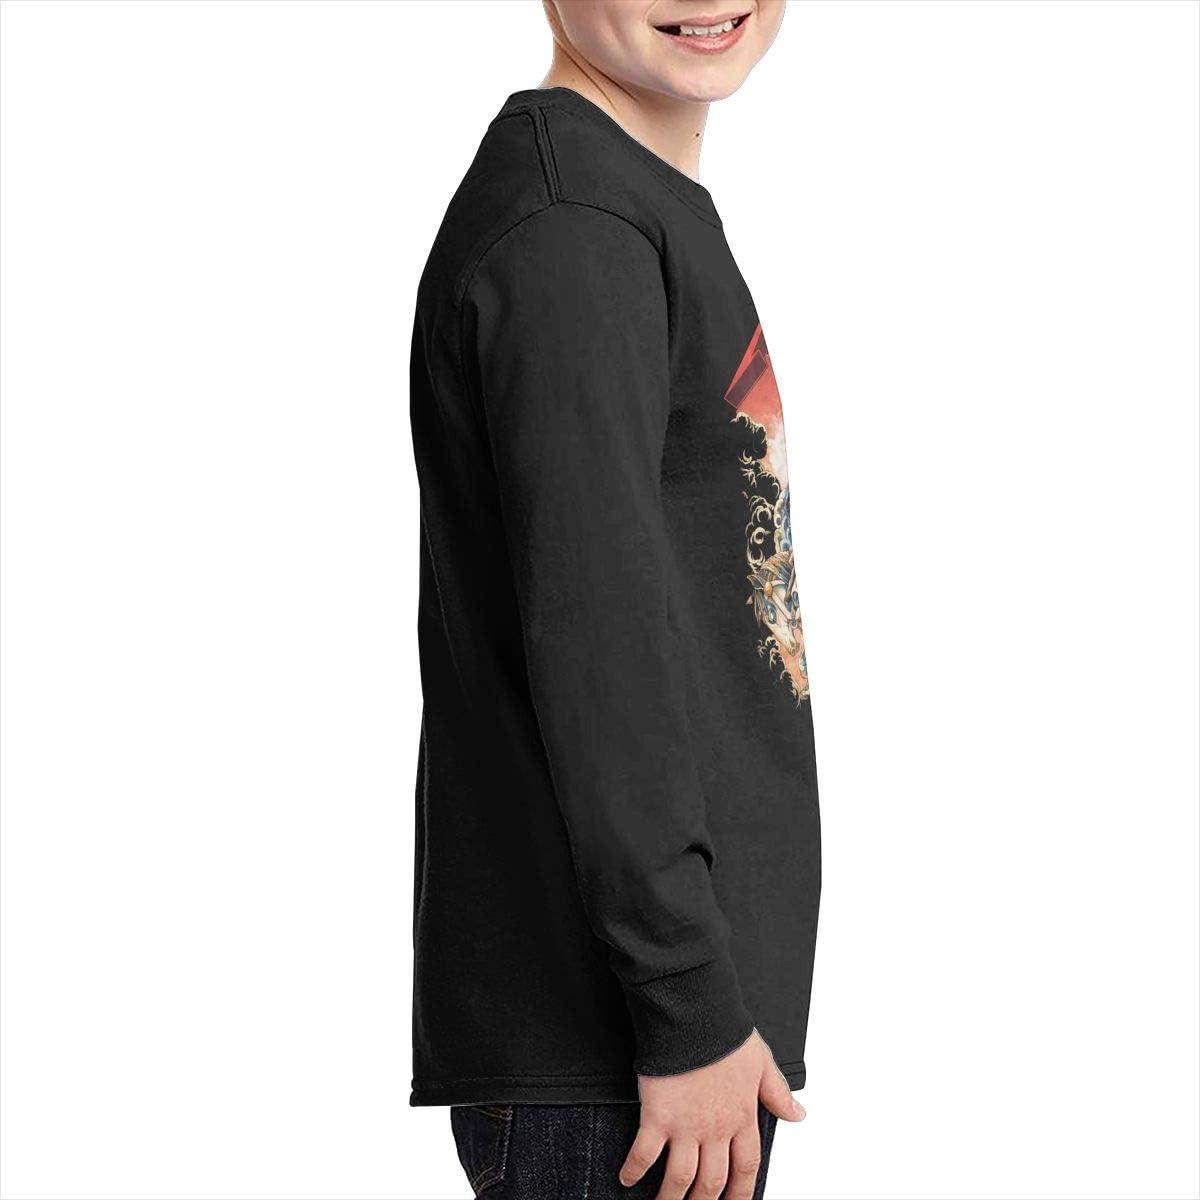 Optumus Metallica Four Horsemen Kids Sweatshirts Long Sleeve T Shirt Boy Girl Children Teenagers Unisex Tee